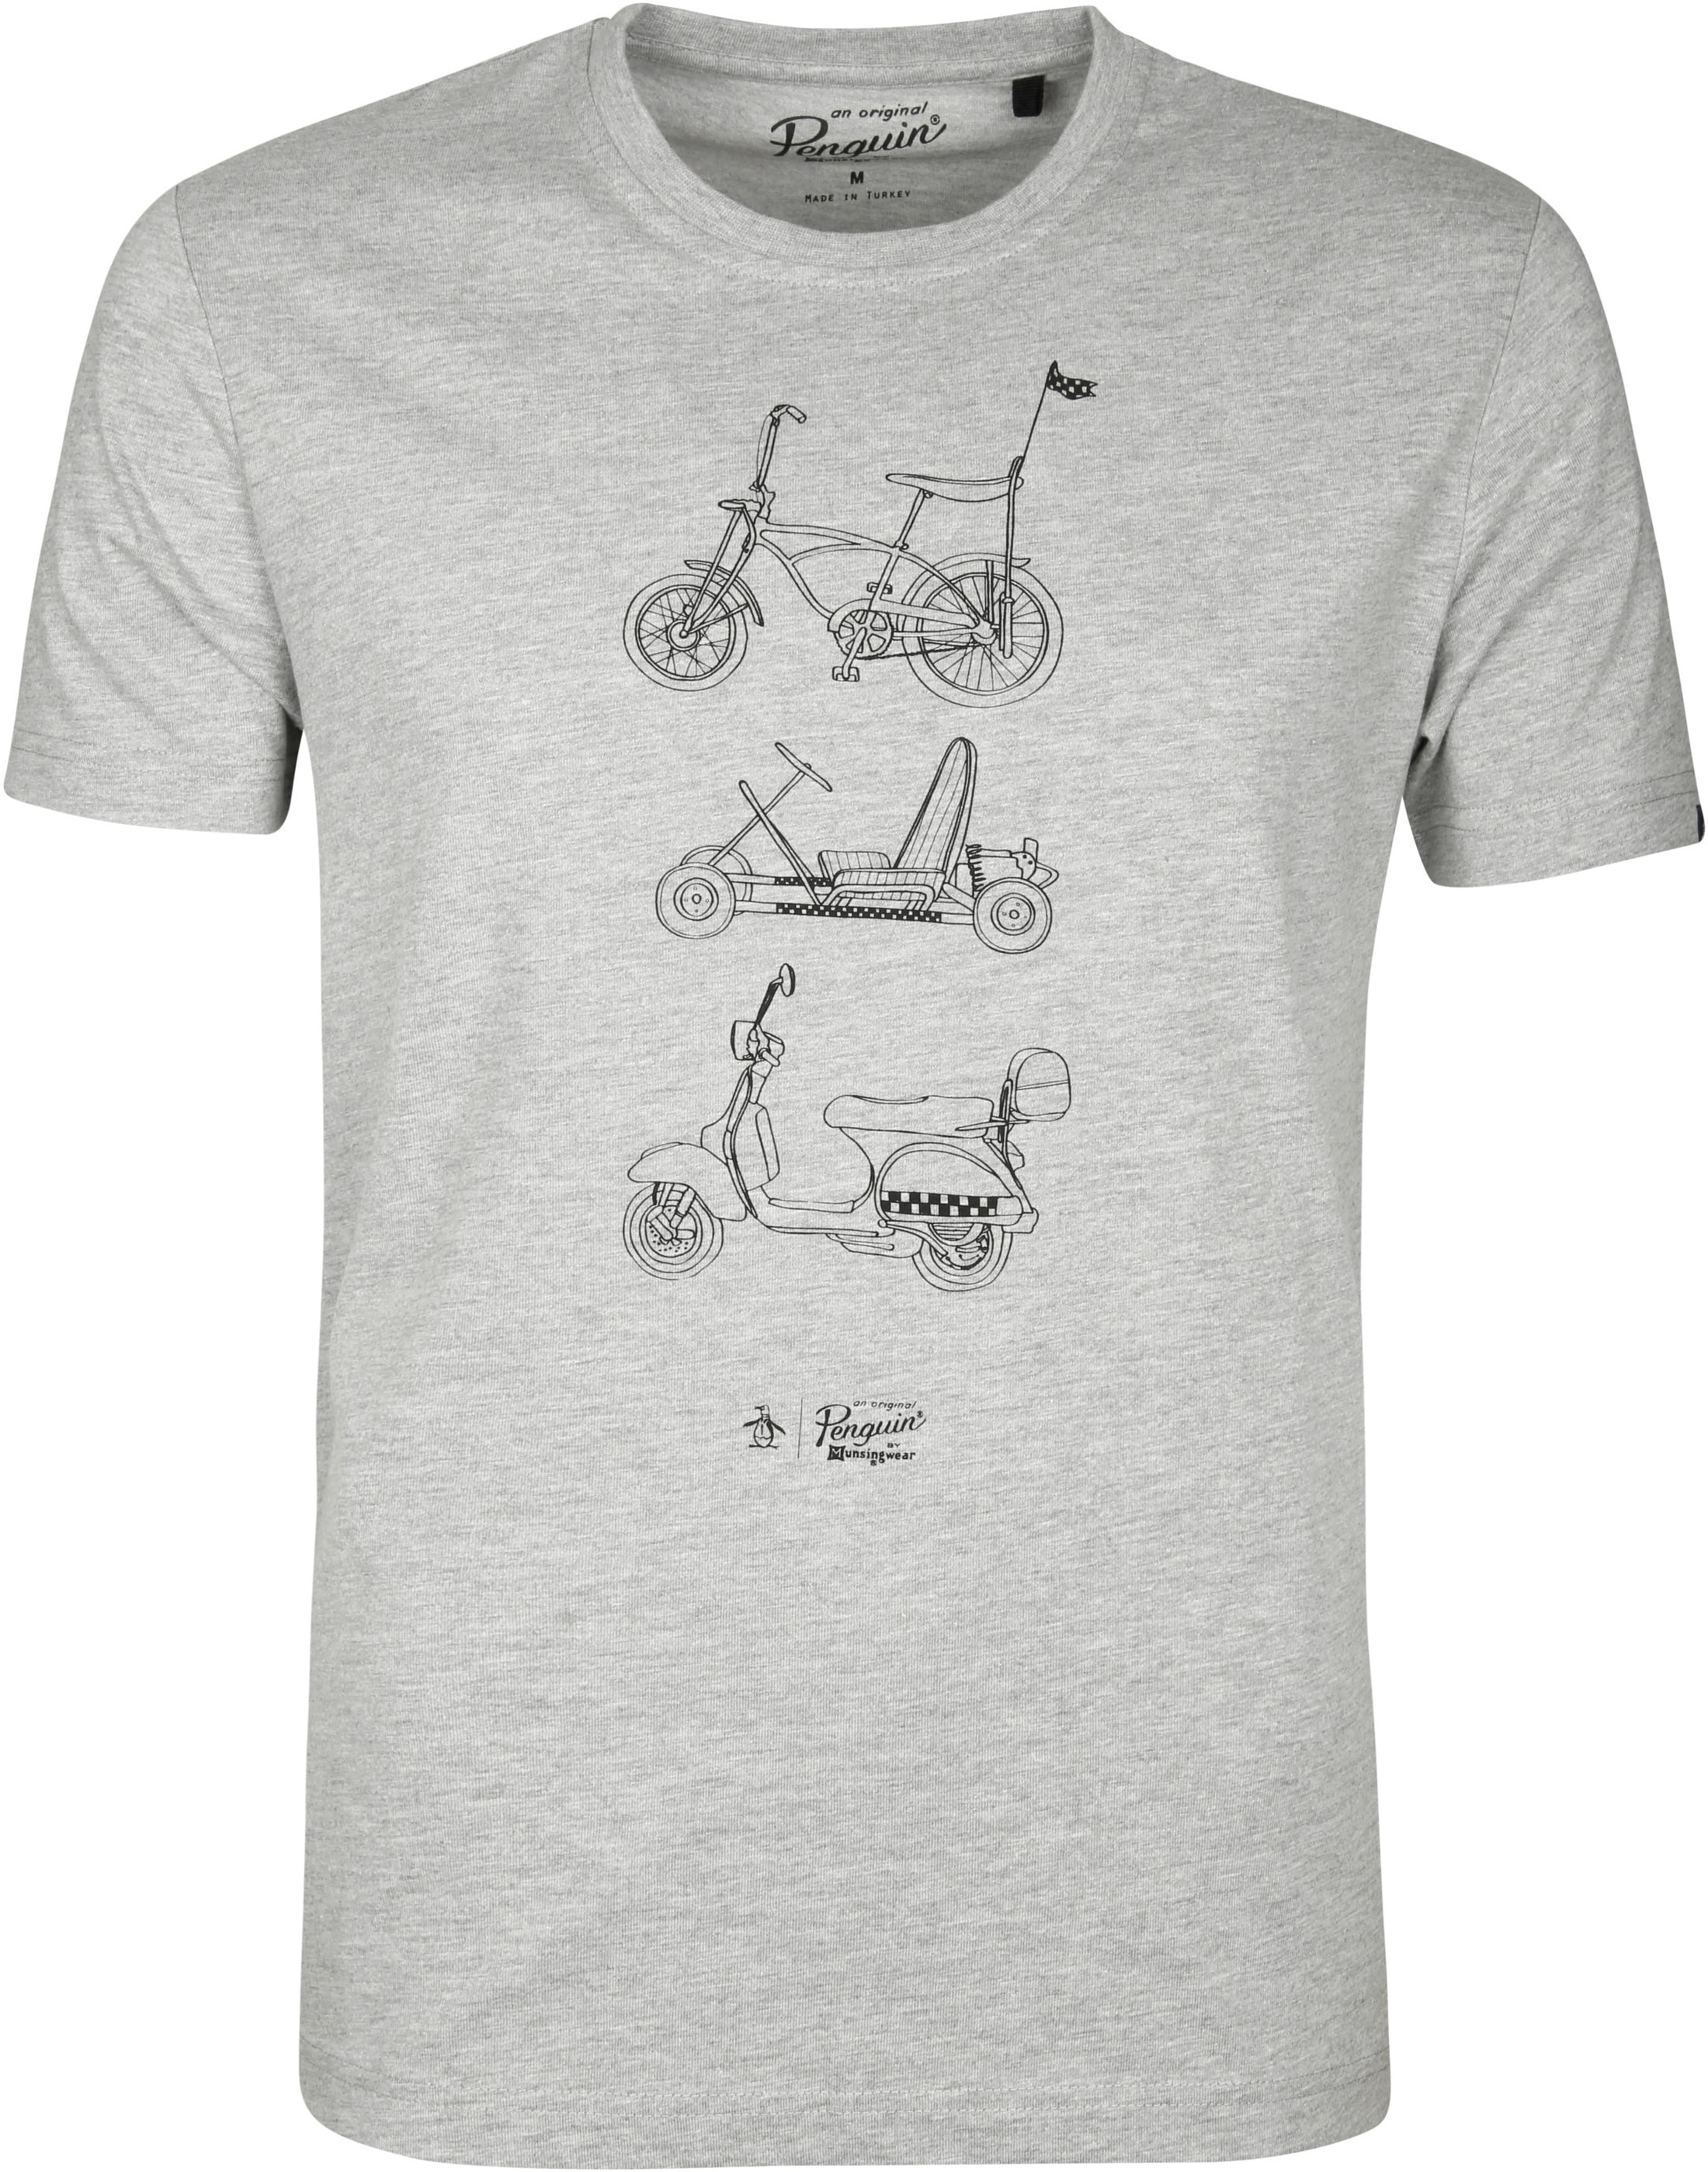 Original Penguin T Shirt Print Grey Opkf8419 080 Order Online Suitable